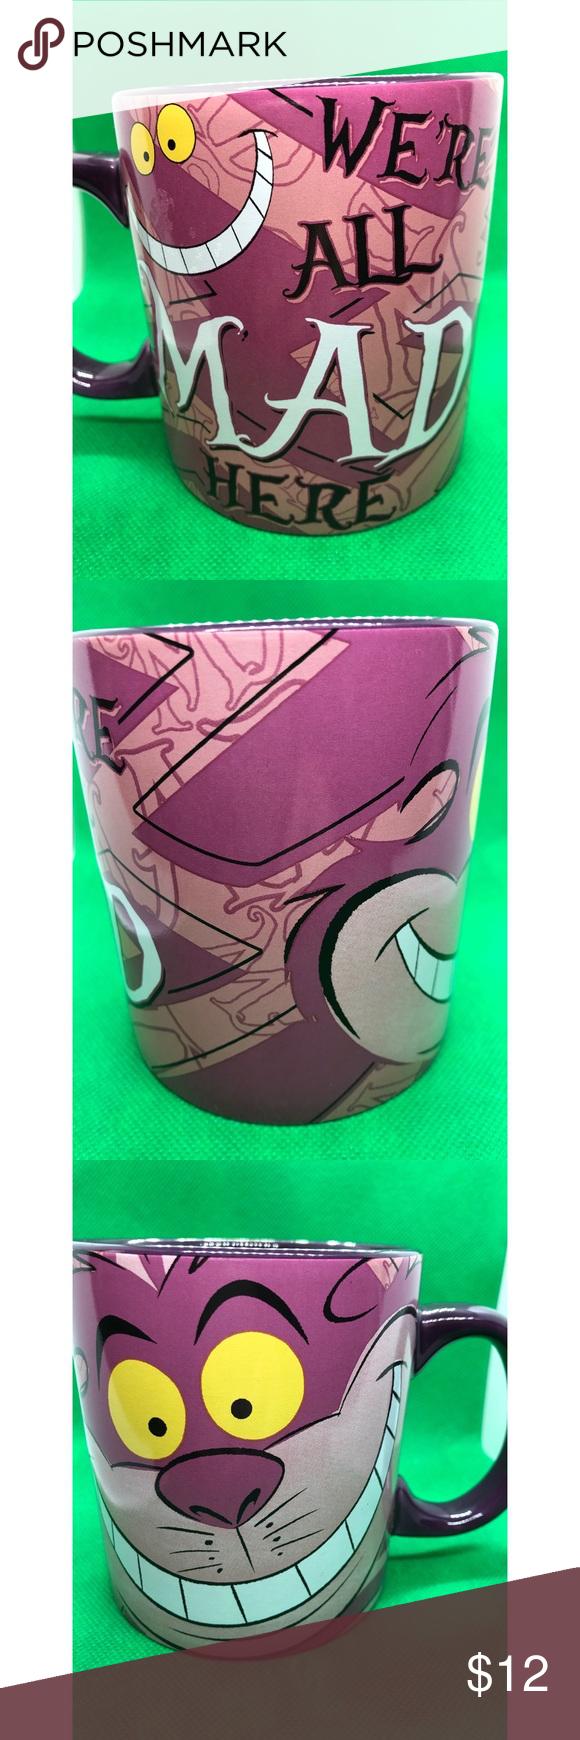 Disney Coffee Mug Disney Coffee Mug - We're All Mad Here Other #disneycoffeemugs